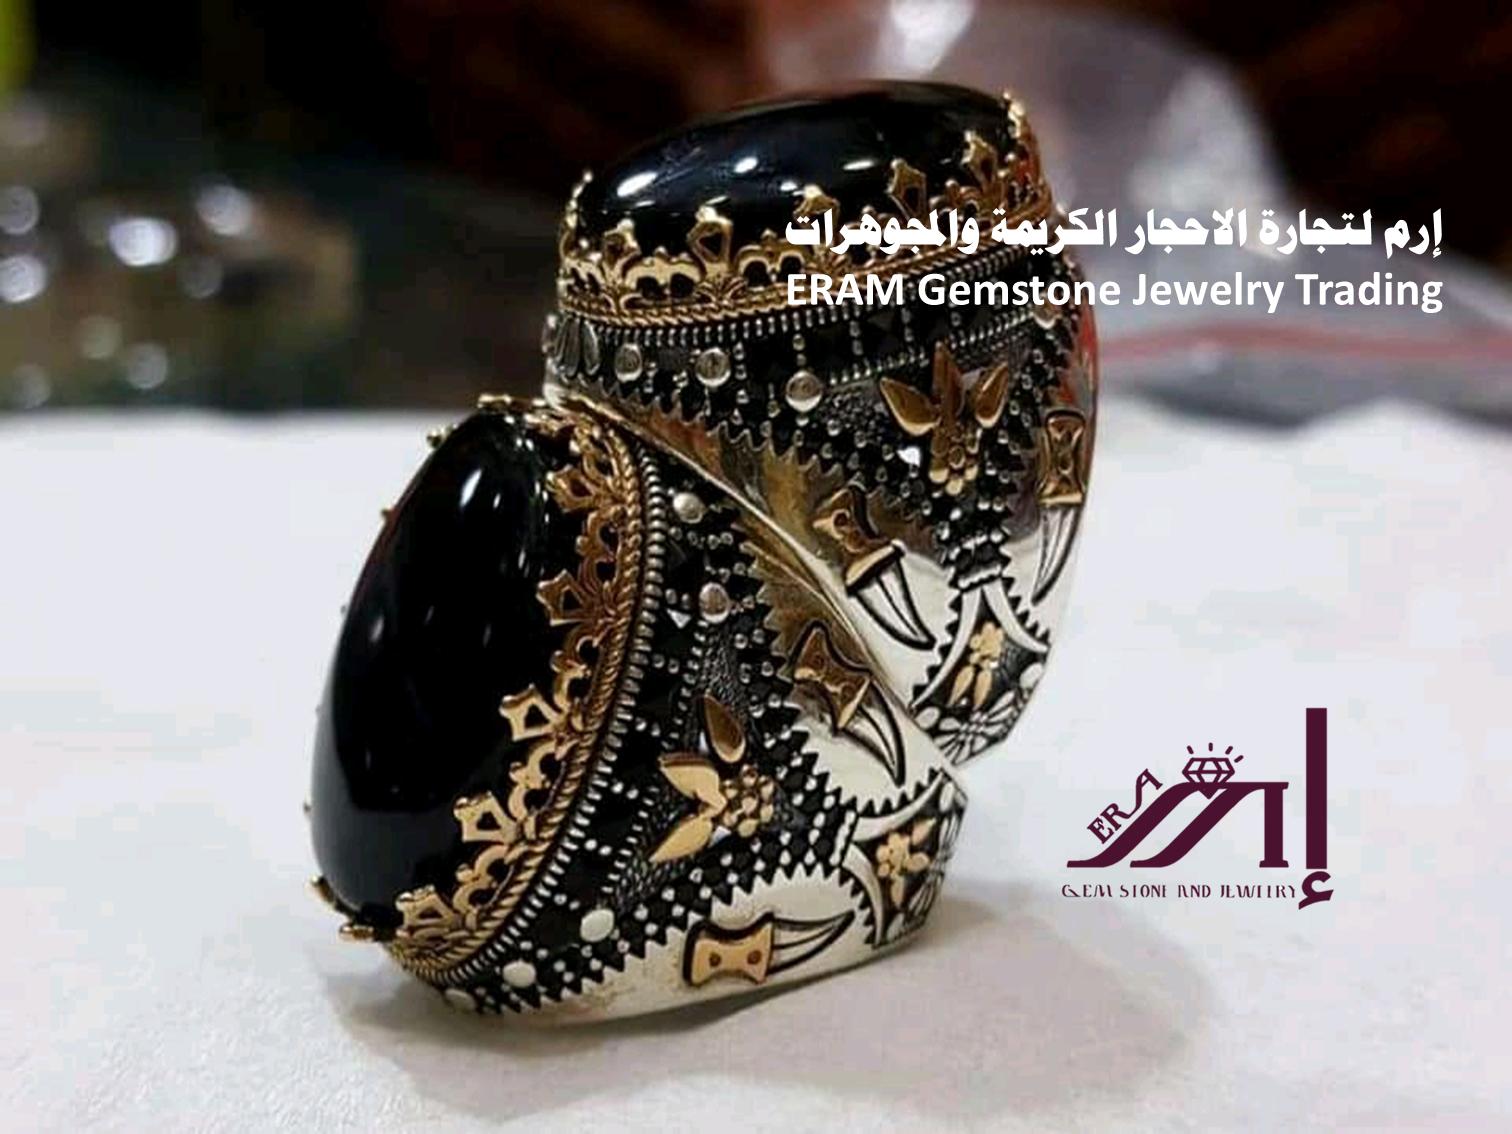 خواتم عقيق يمني اسود Agate مميز طبيعي100 الموديل 2 للعرض Gemstones Cuff Bracelets Gemstone Jewelry